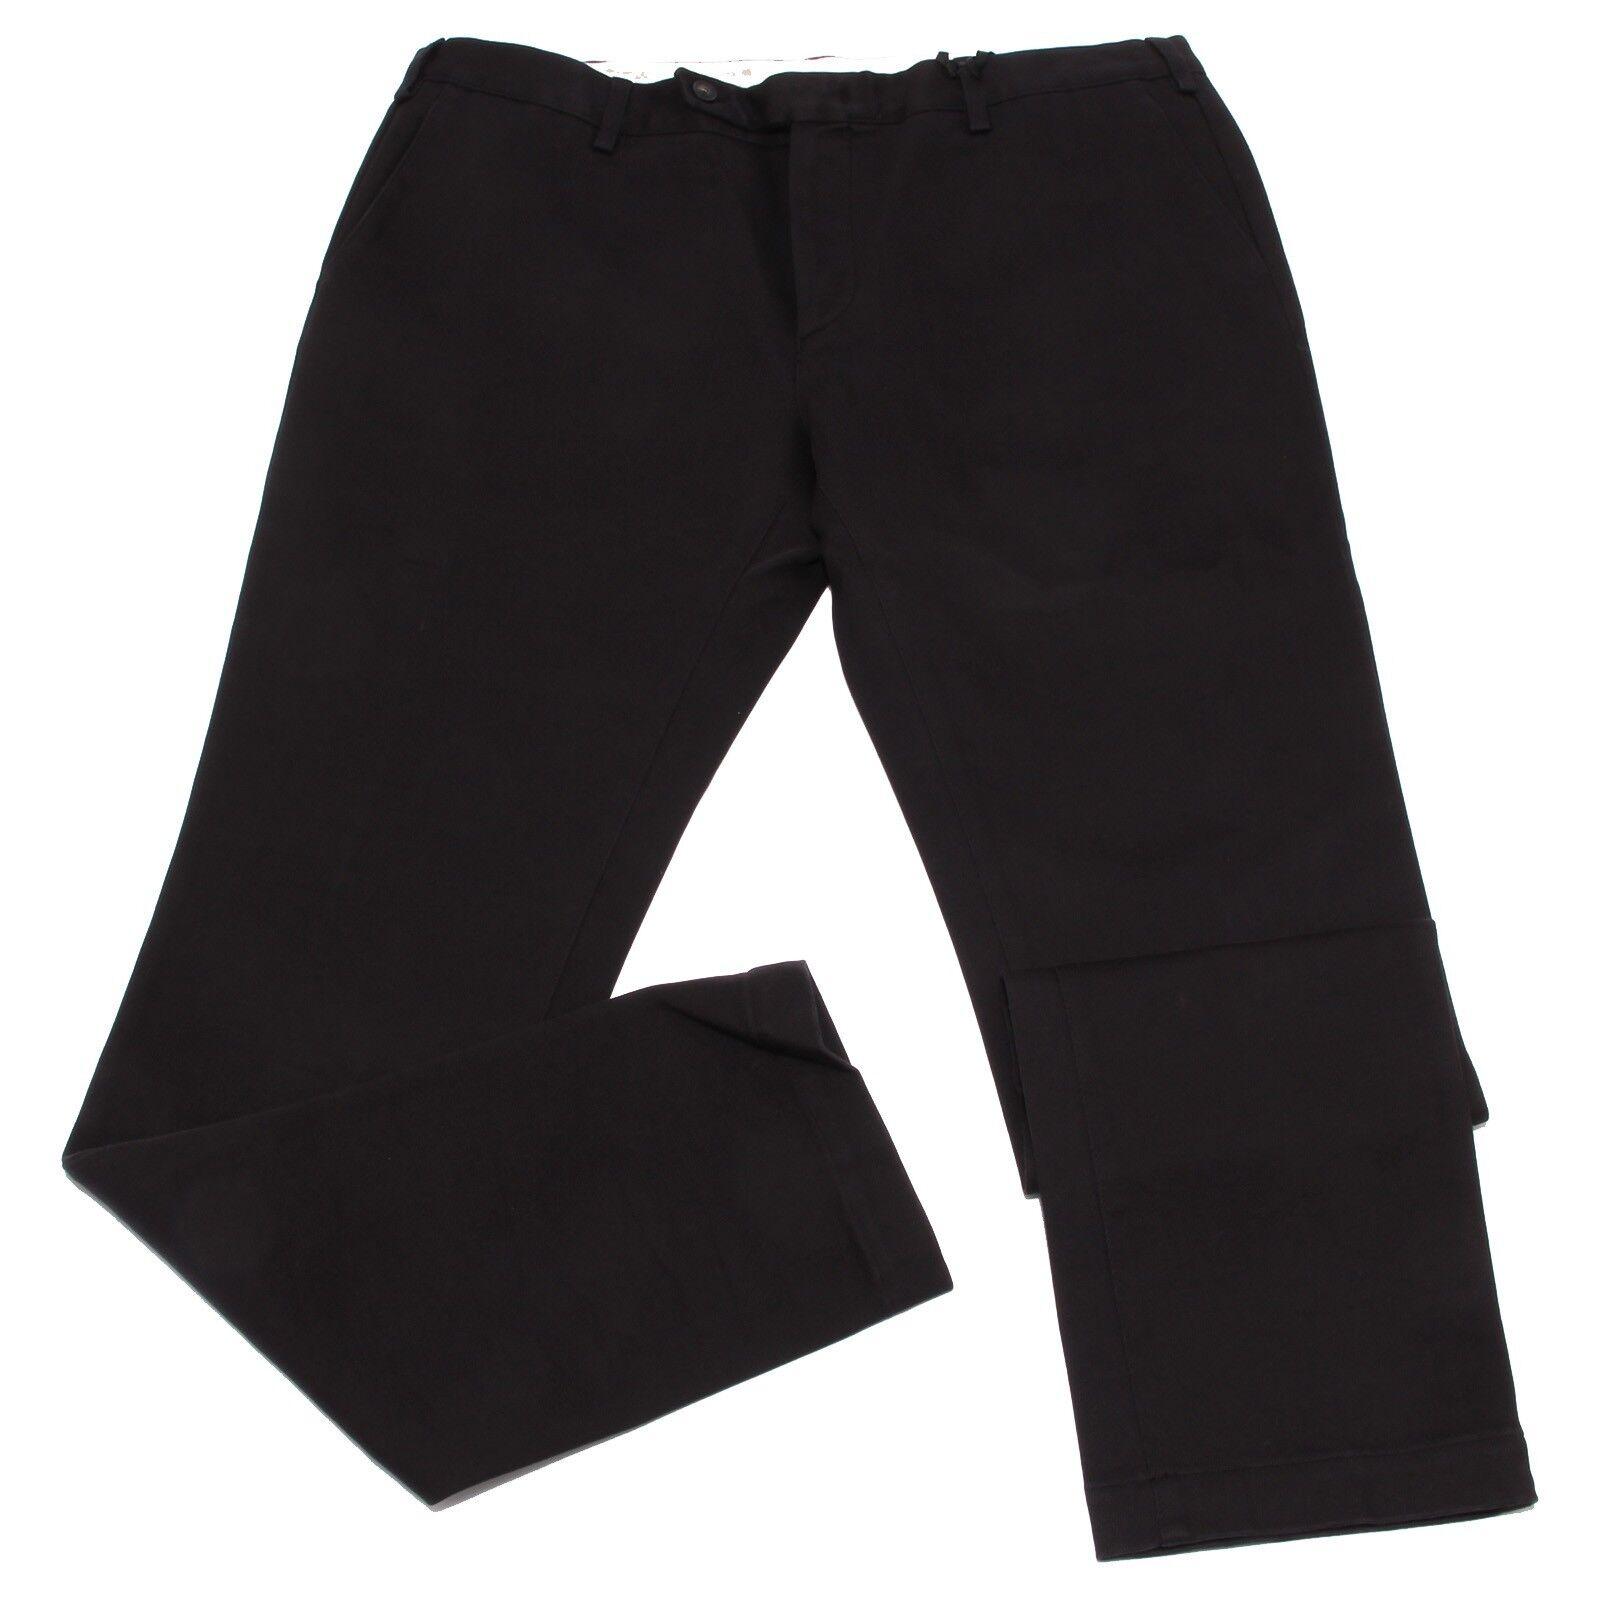 1990W pantaloni uomo MAURO GRIFONI nero cotton trouser men